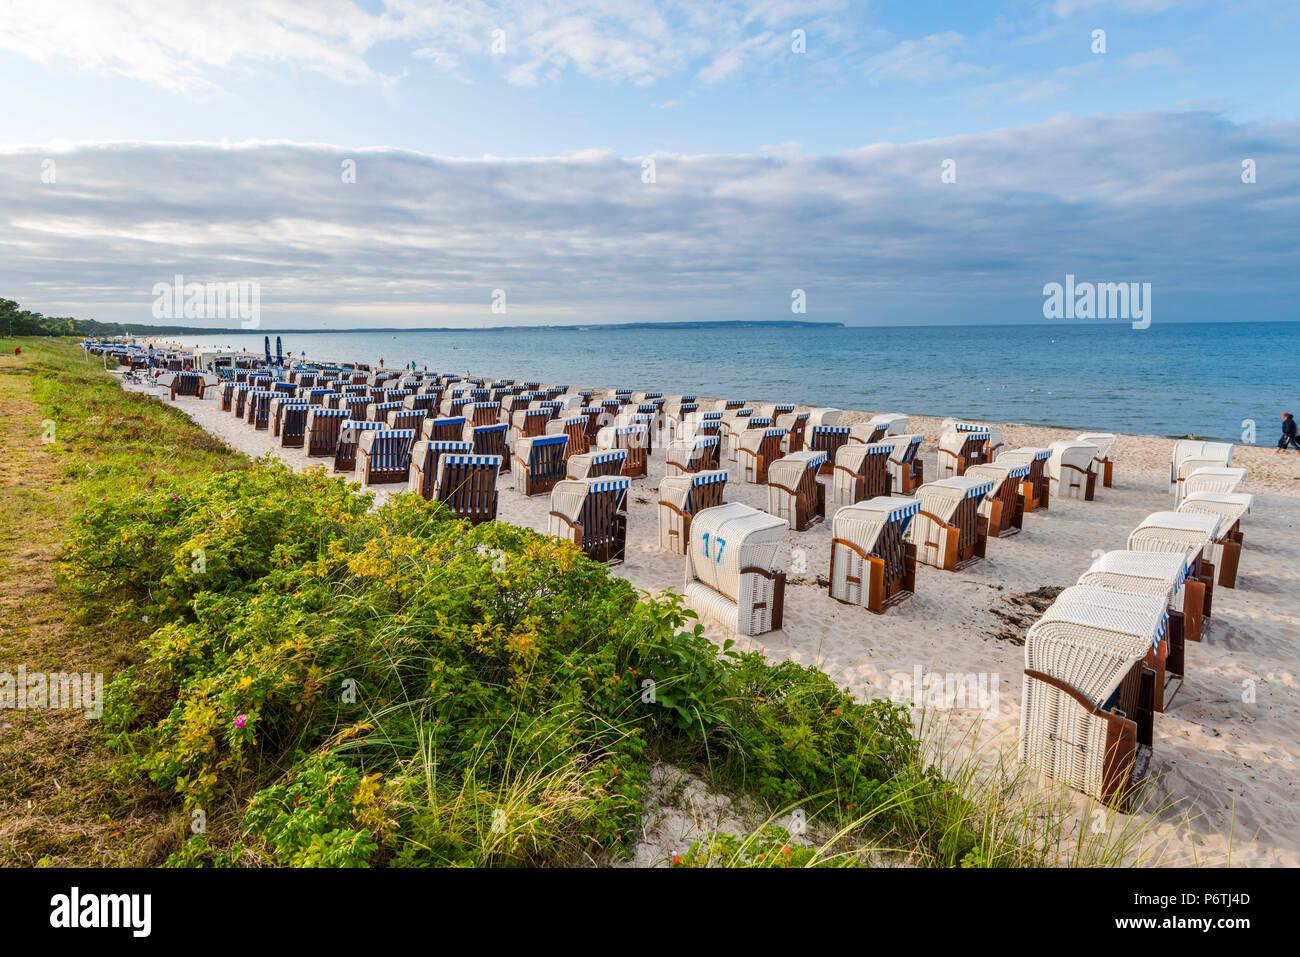 Rugen Island, Baltic coast, Mecklenburg-Western Pomerania, Germany. - Stock Image